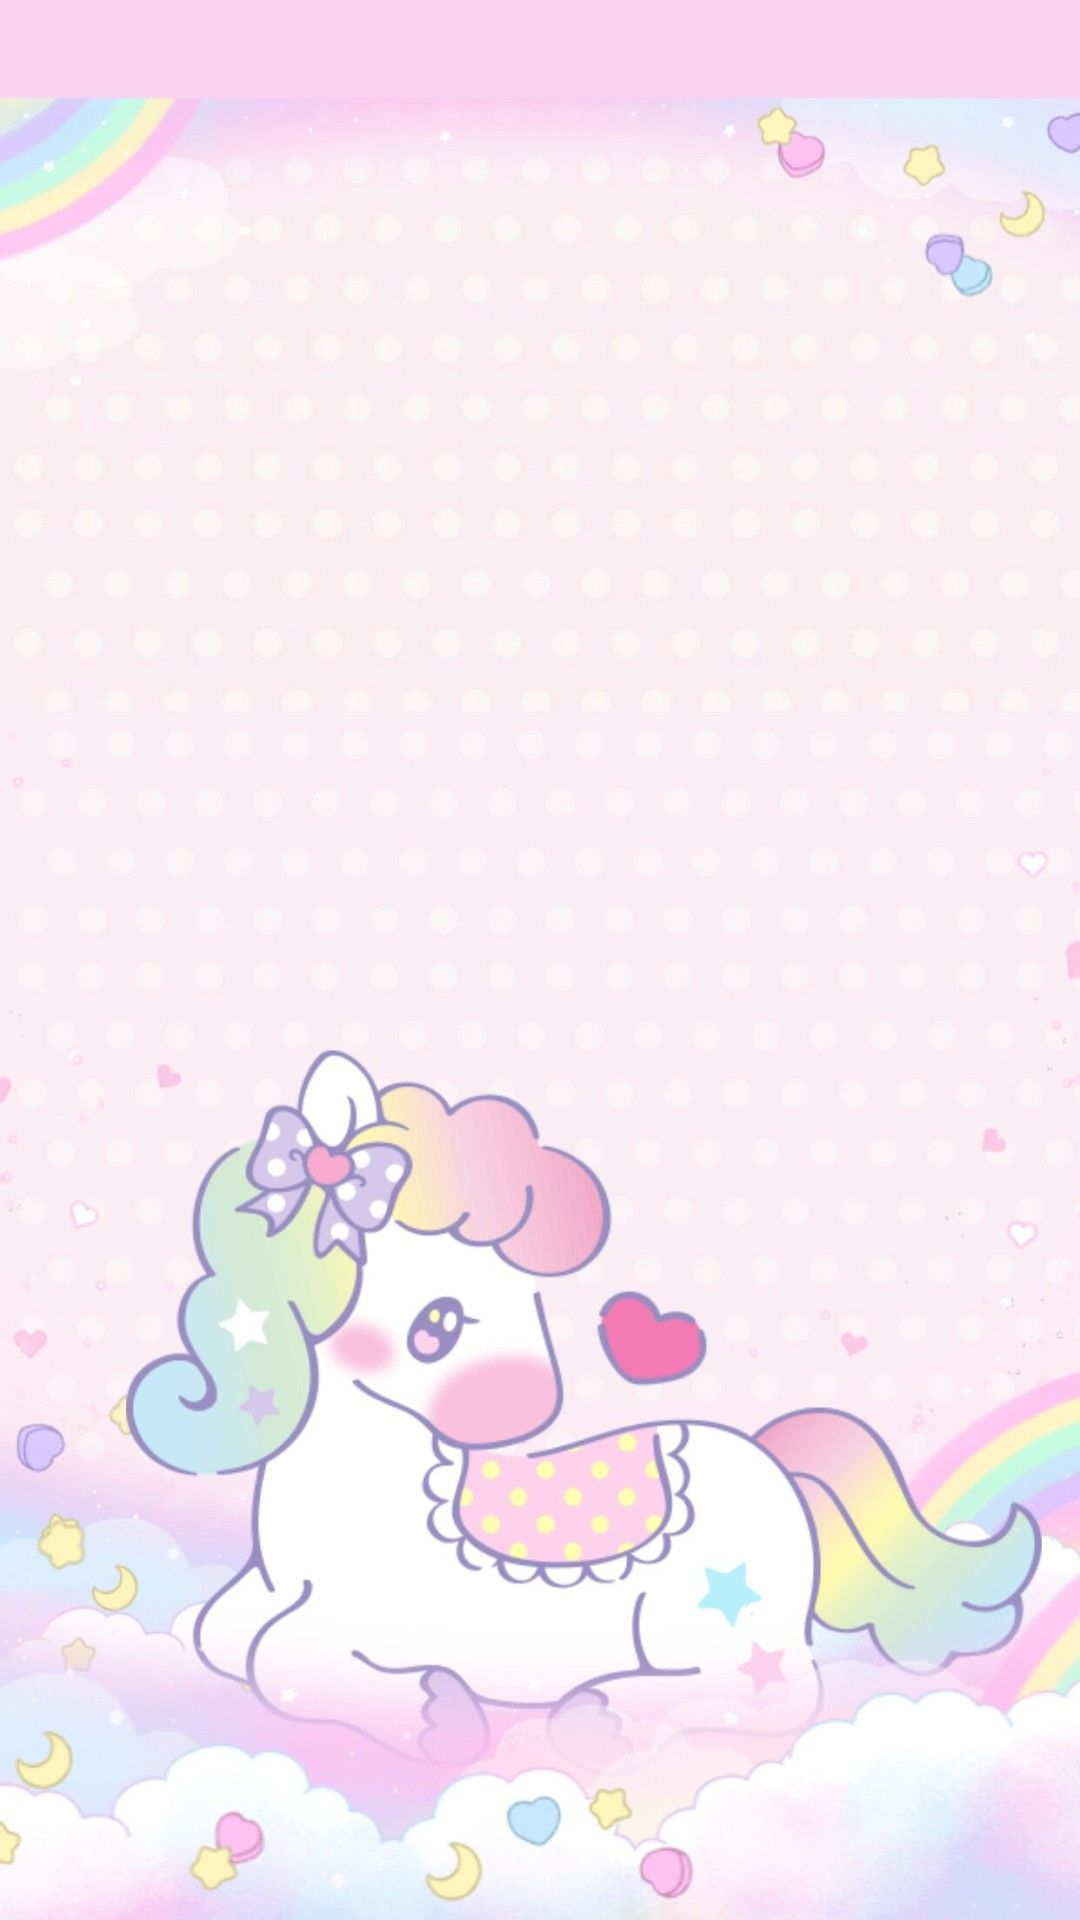 Jenn Heymi243 My Melody Unicorn Wallpaper By Me Unicorn Wallpaper Pink Unicorn Wallpaper Sanrio Wallpaper